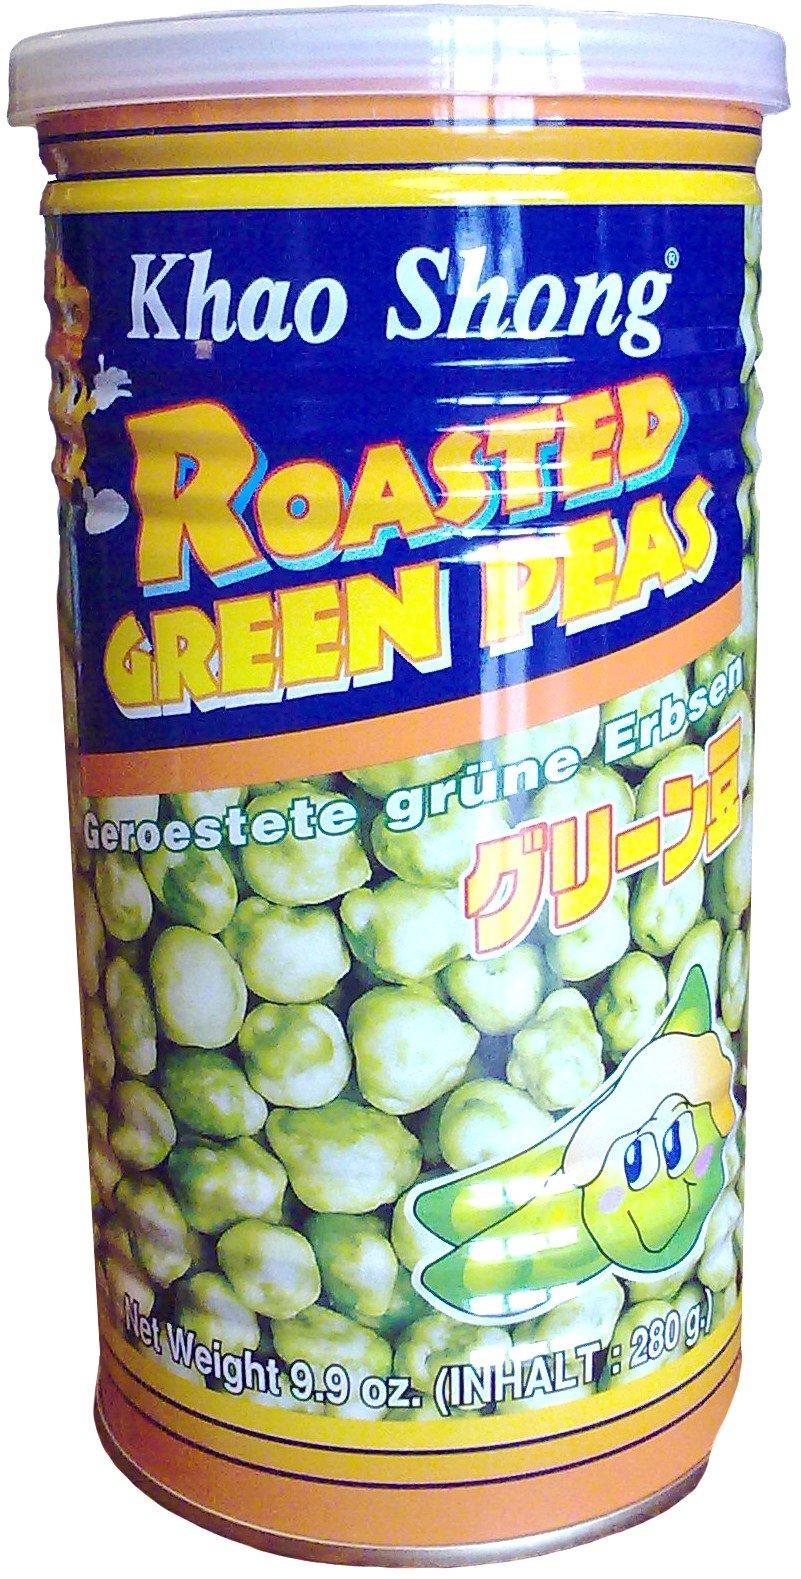 Khao Shong Snack Cracker Roasted Green Peas, 280-Grams (Pack of 4)